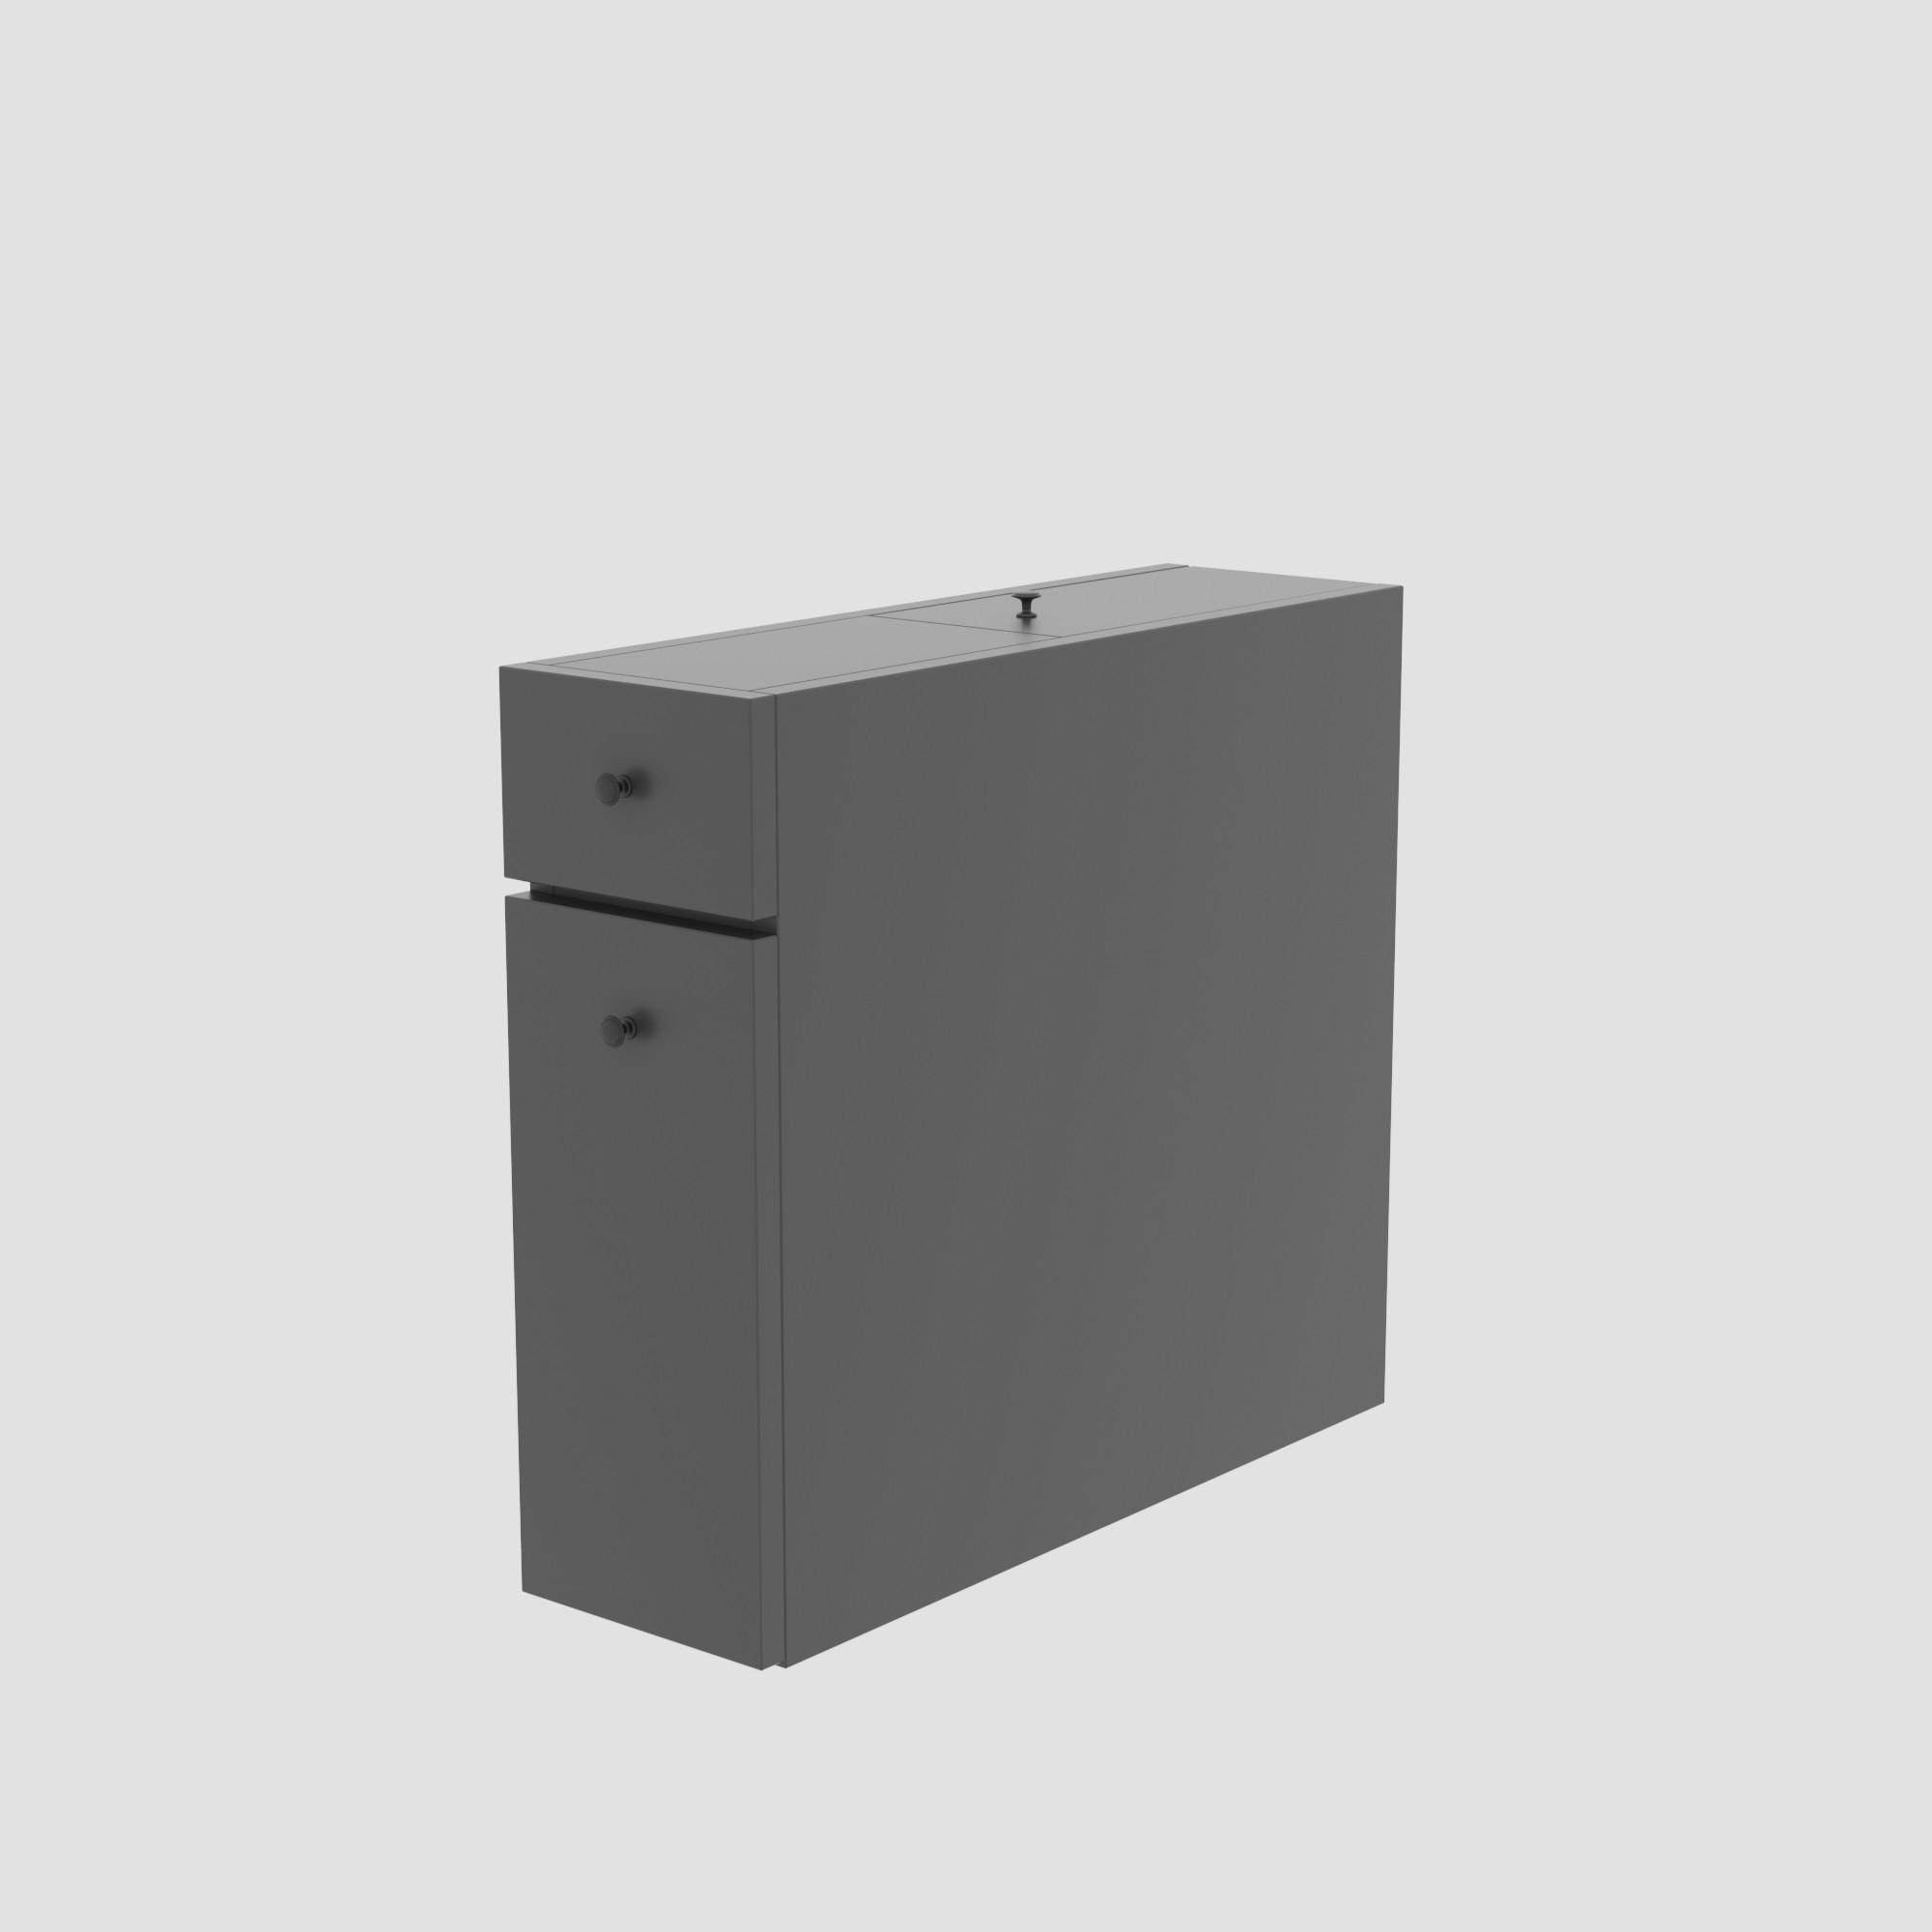 Multipurpose Cabinet Calencia | Anthracite